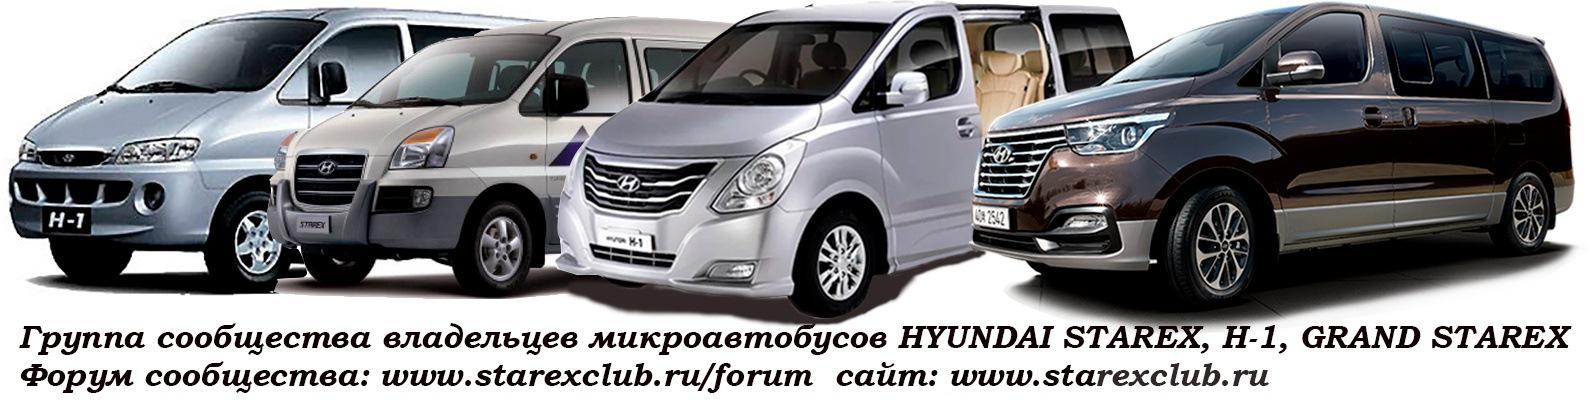 клуб владельцев hyundai h-1 (grand starex)